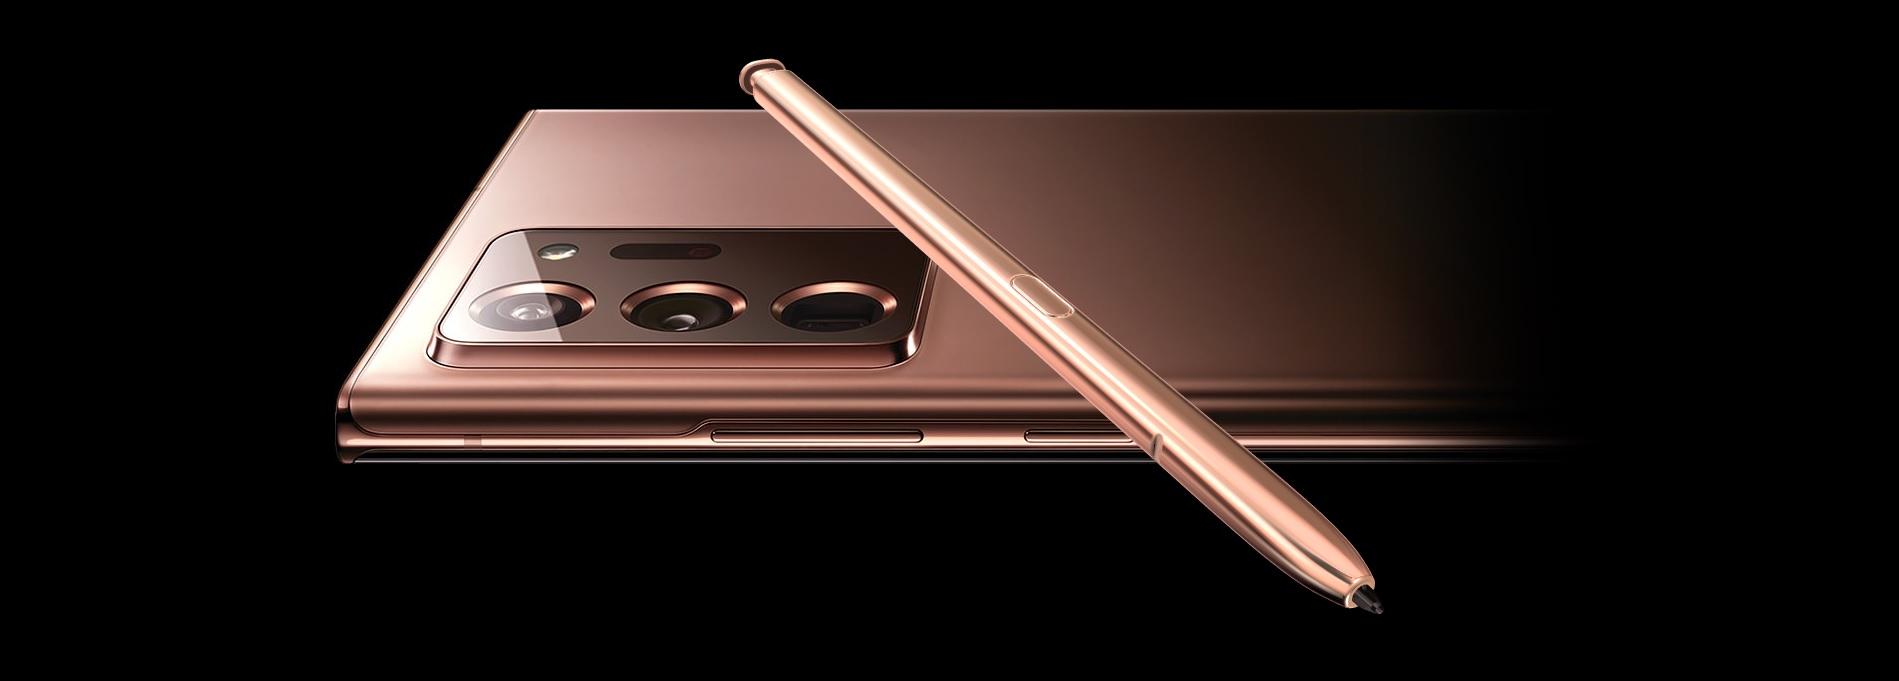 smartfon Samsung Galaxy Note 20 Ultra smartphone